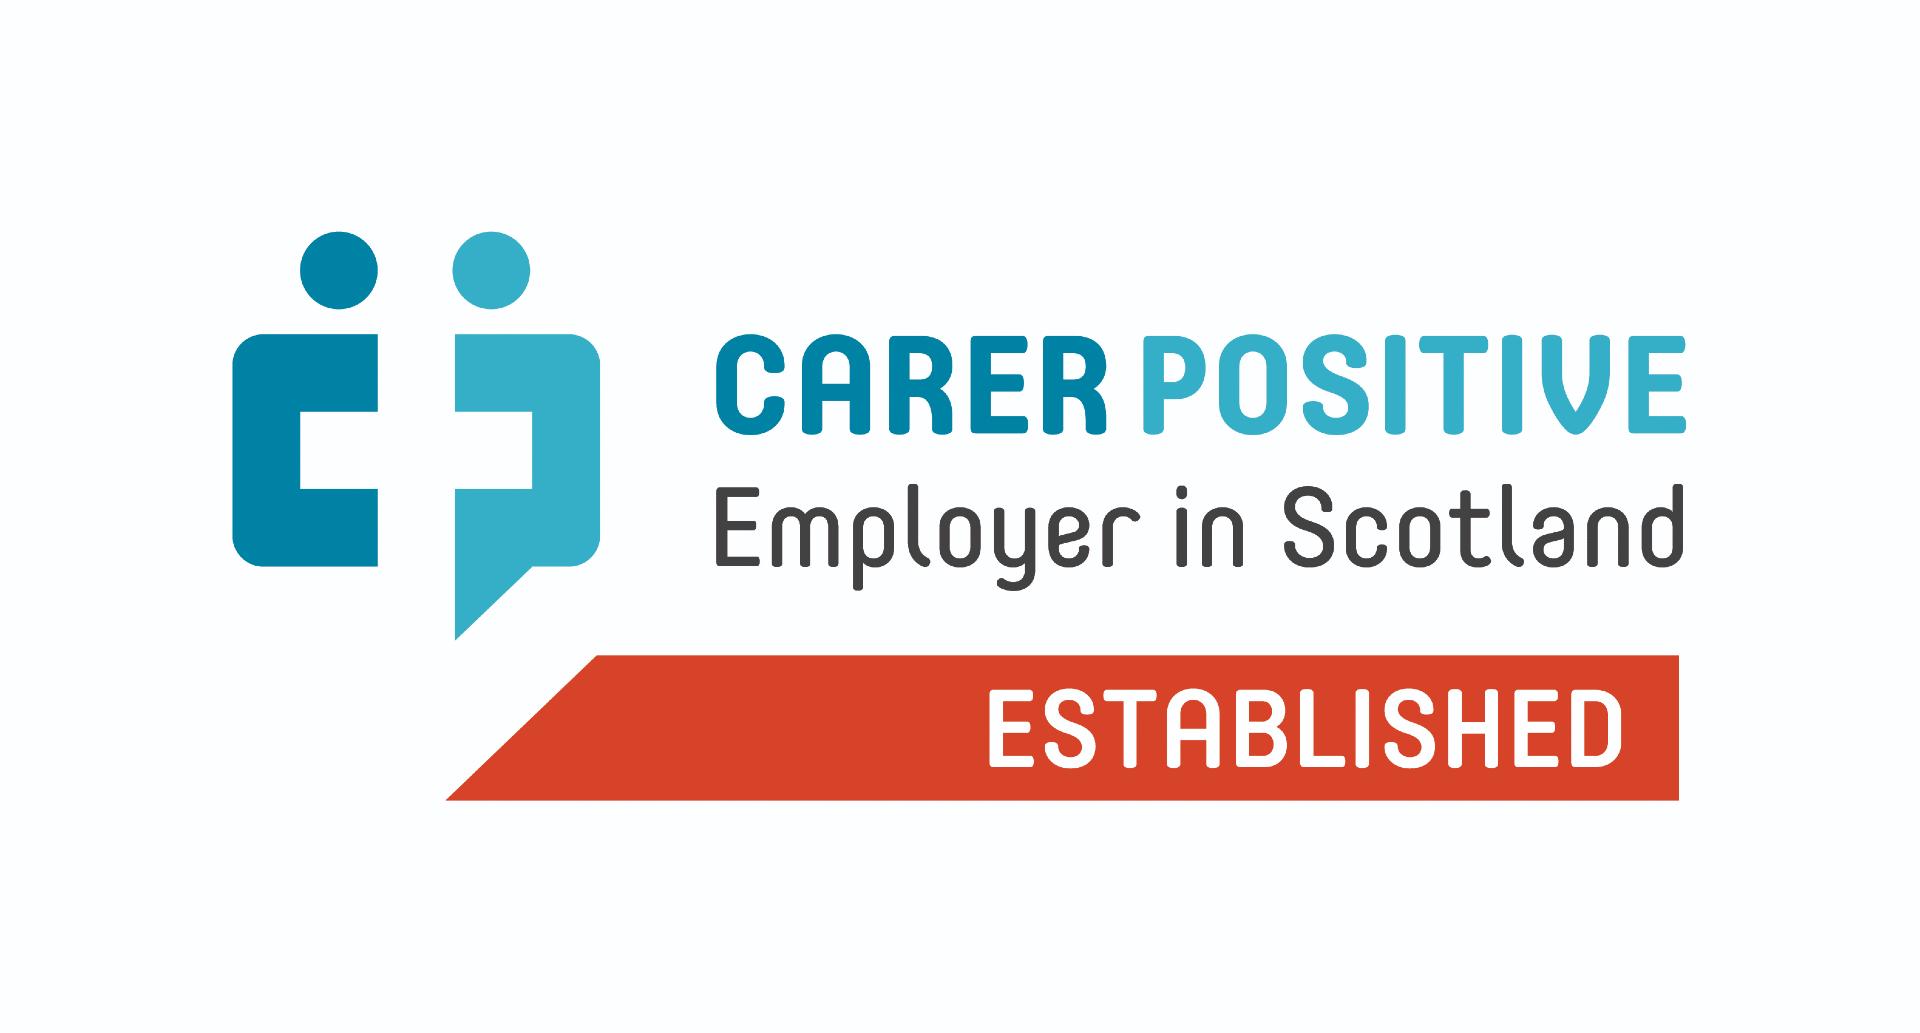 Carers Scotland recognises eCom Scotland as an Established Caring Employer